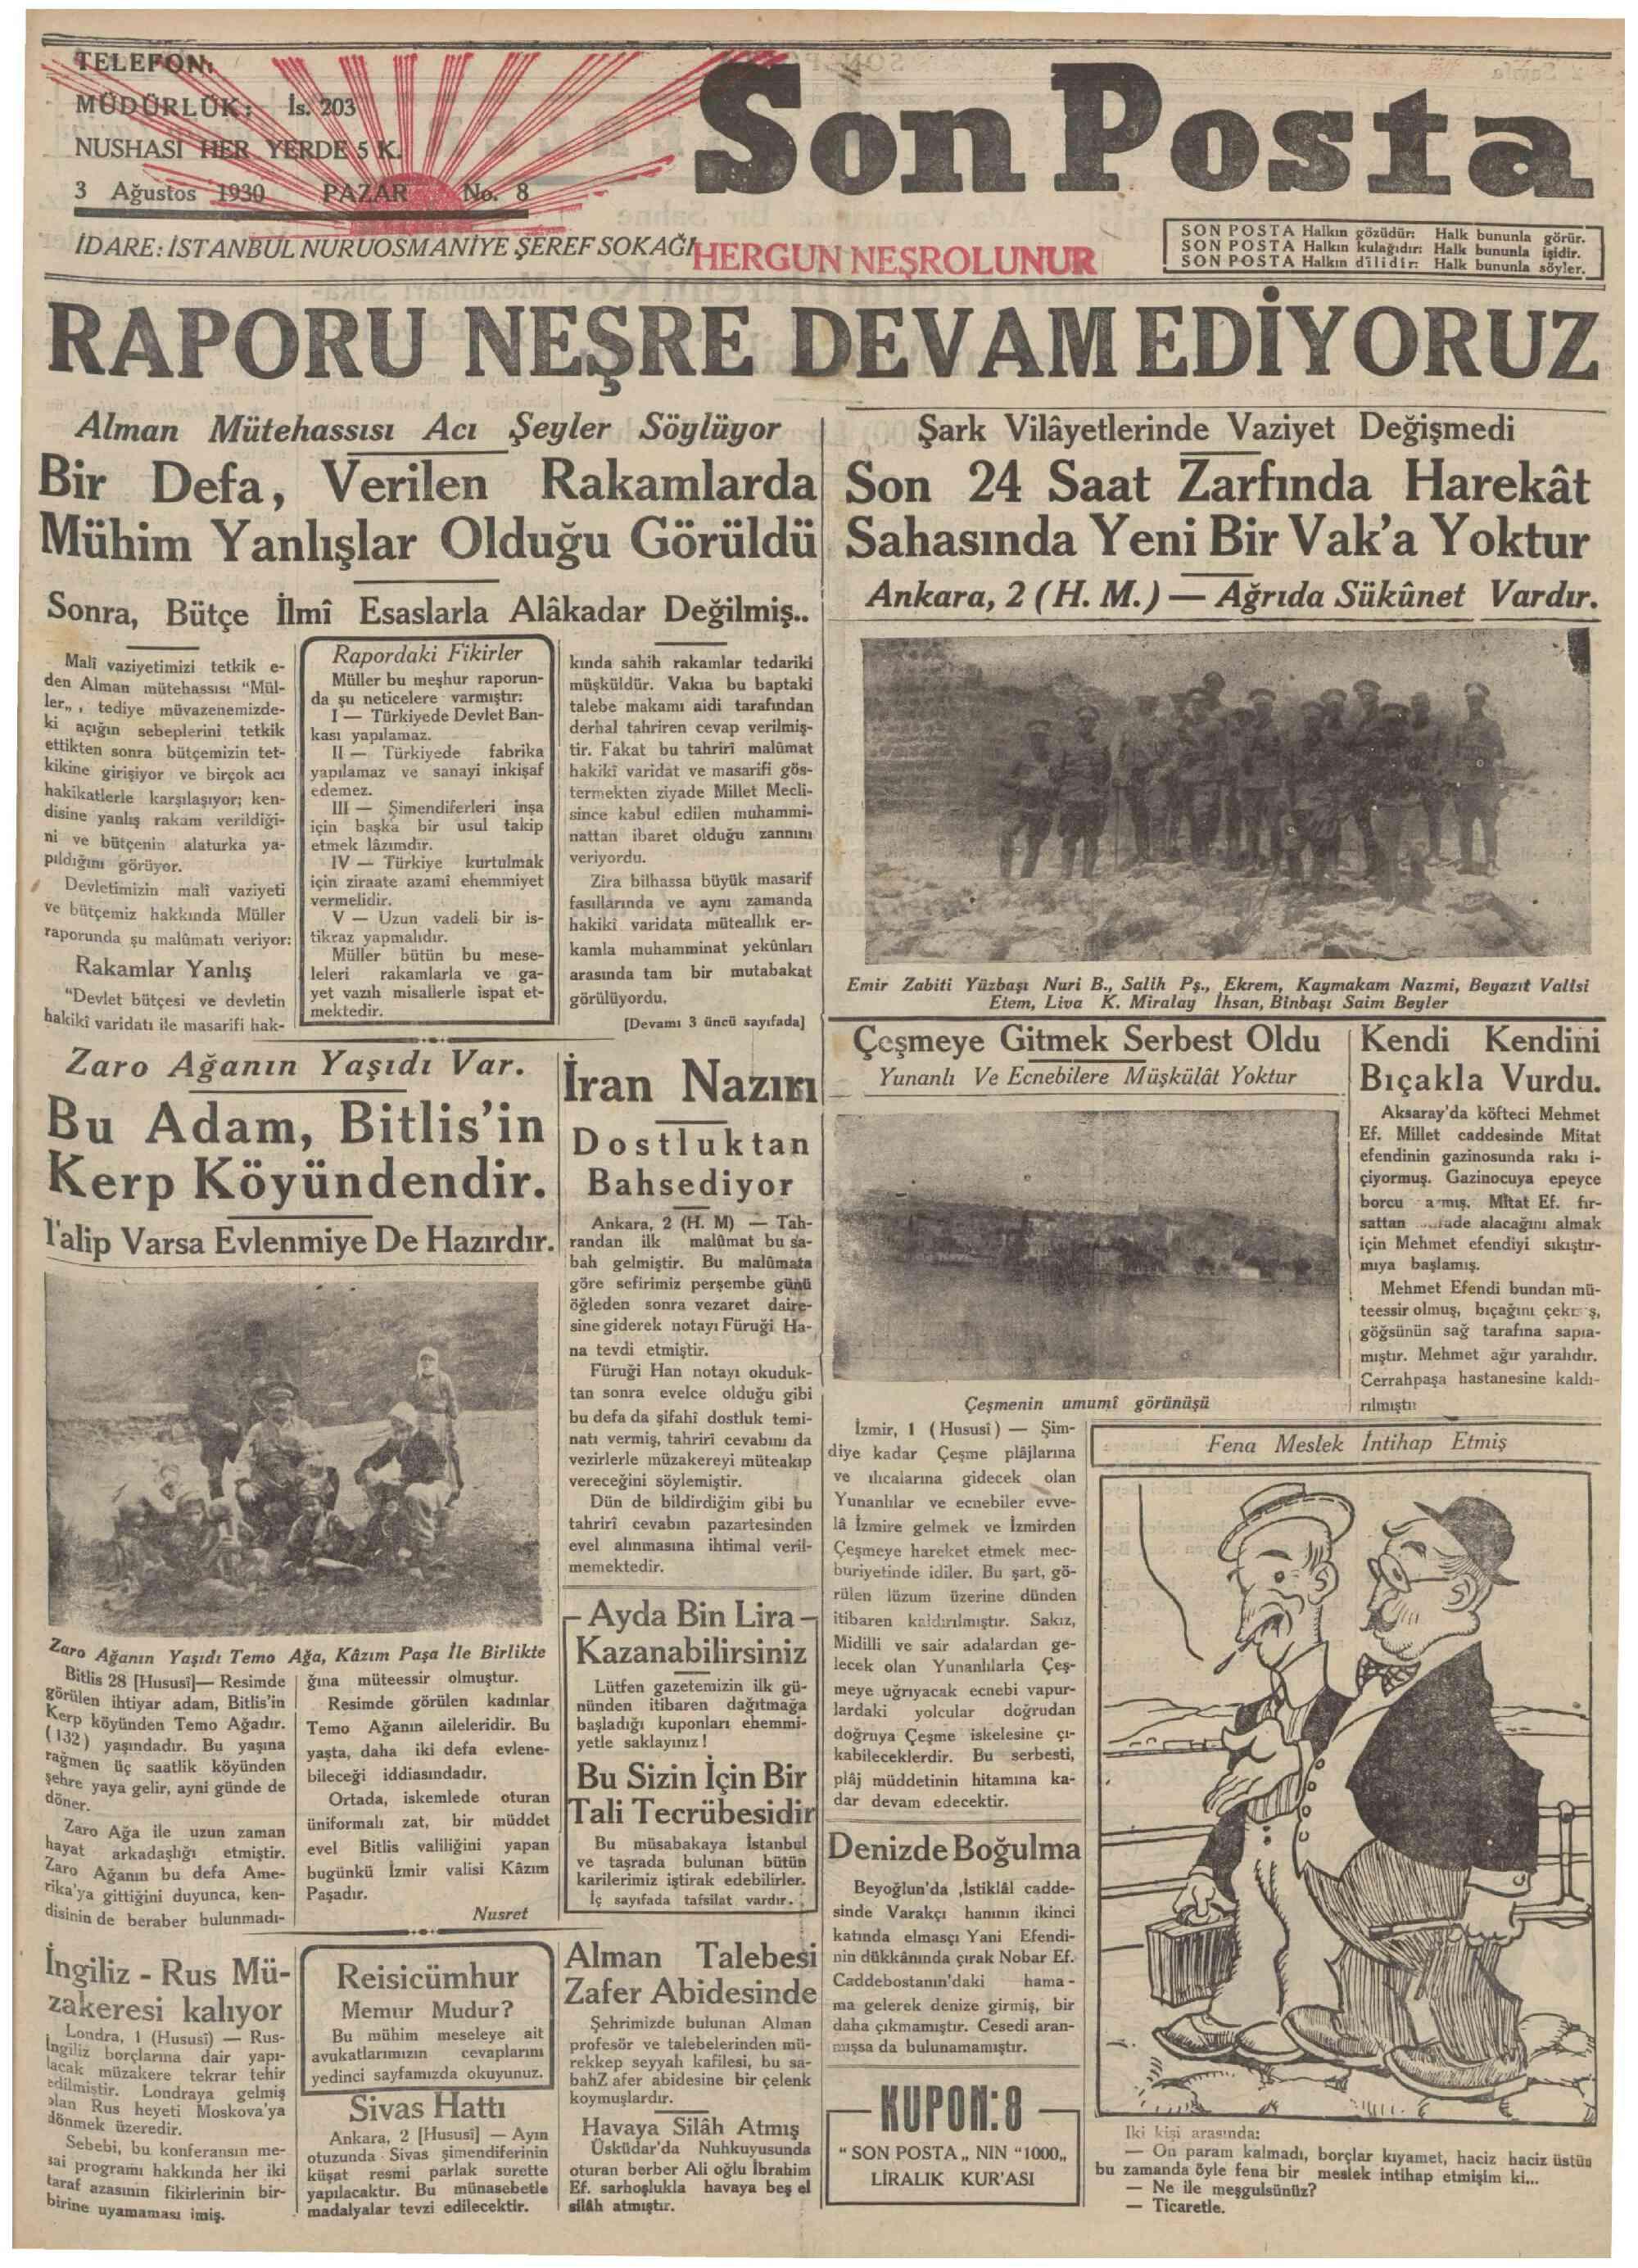 3 Ağustos 1930 Tarihli Son Posta Gazetesi Sayfa 1